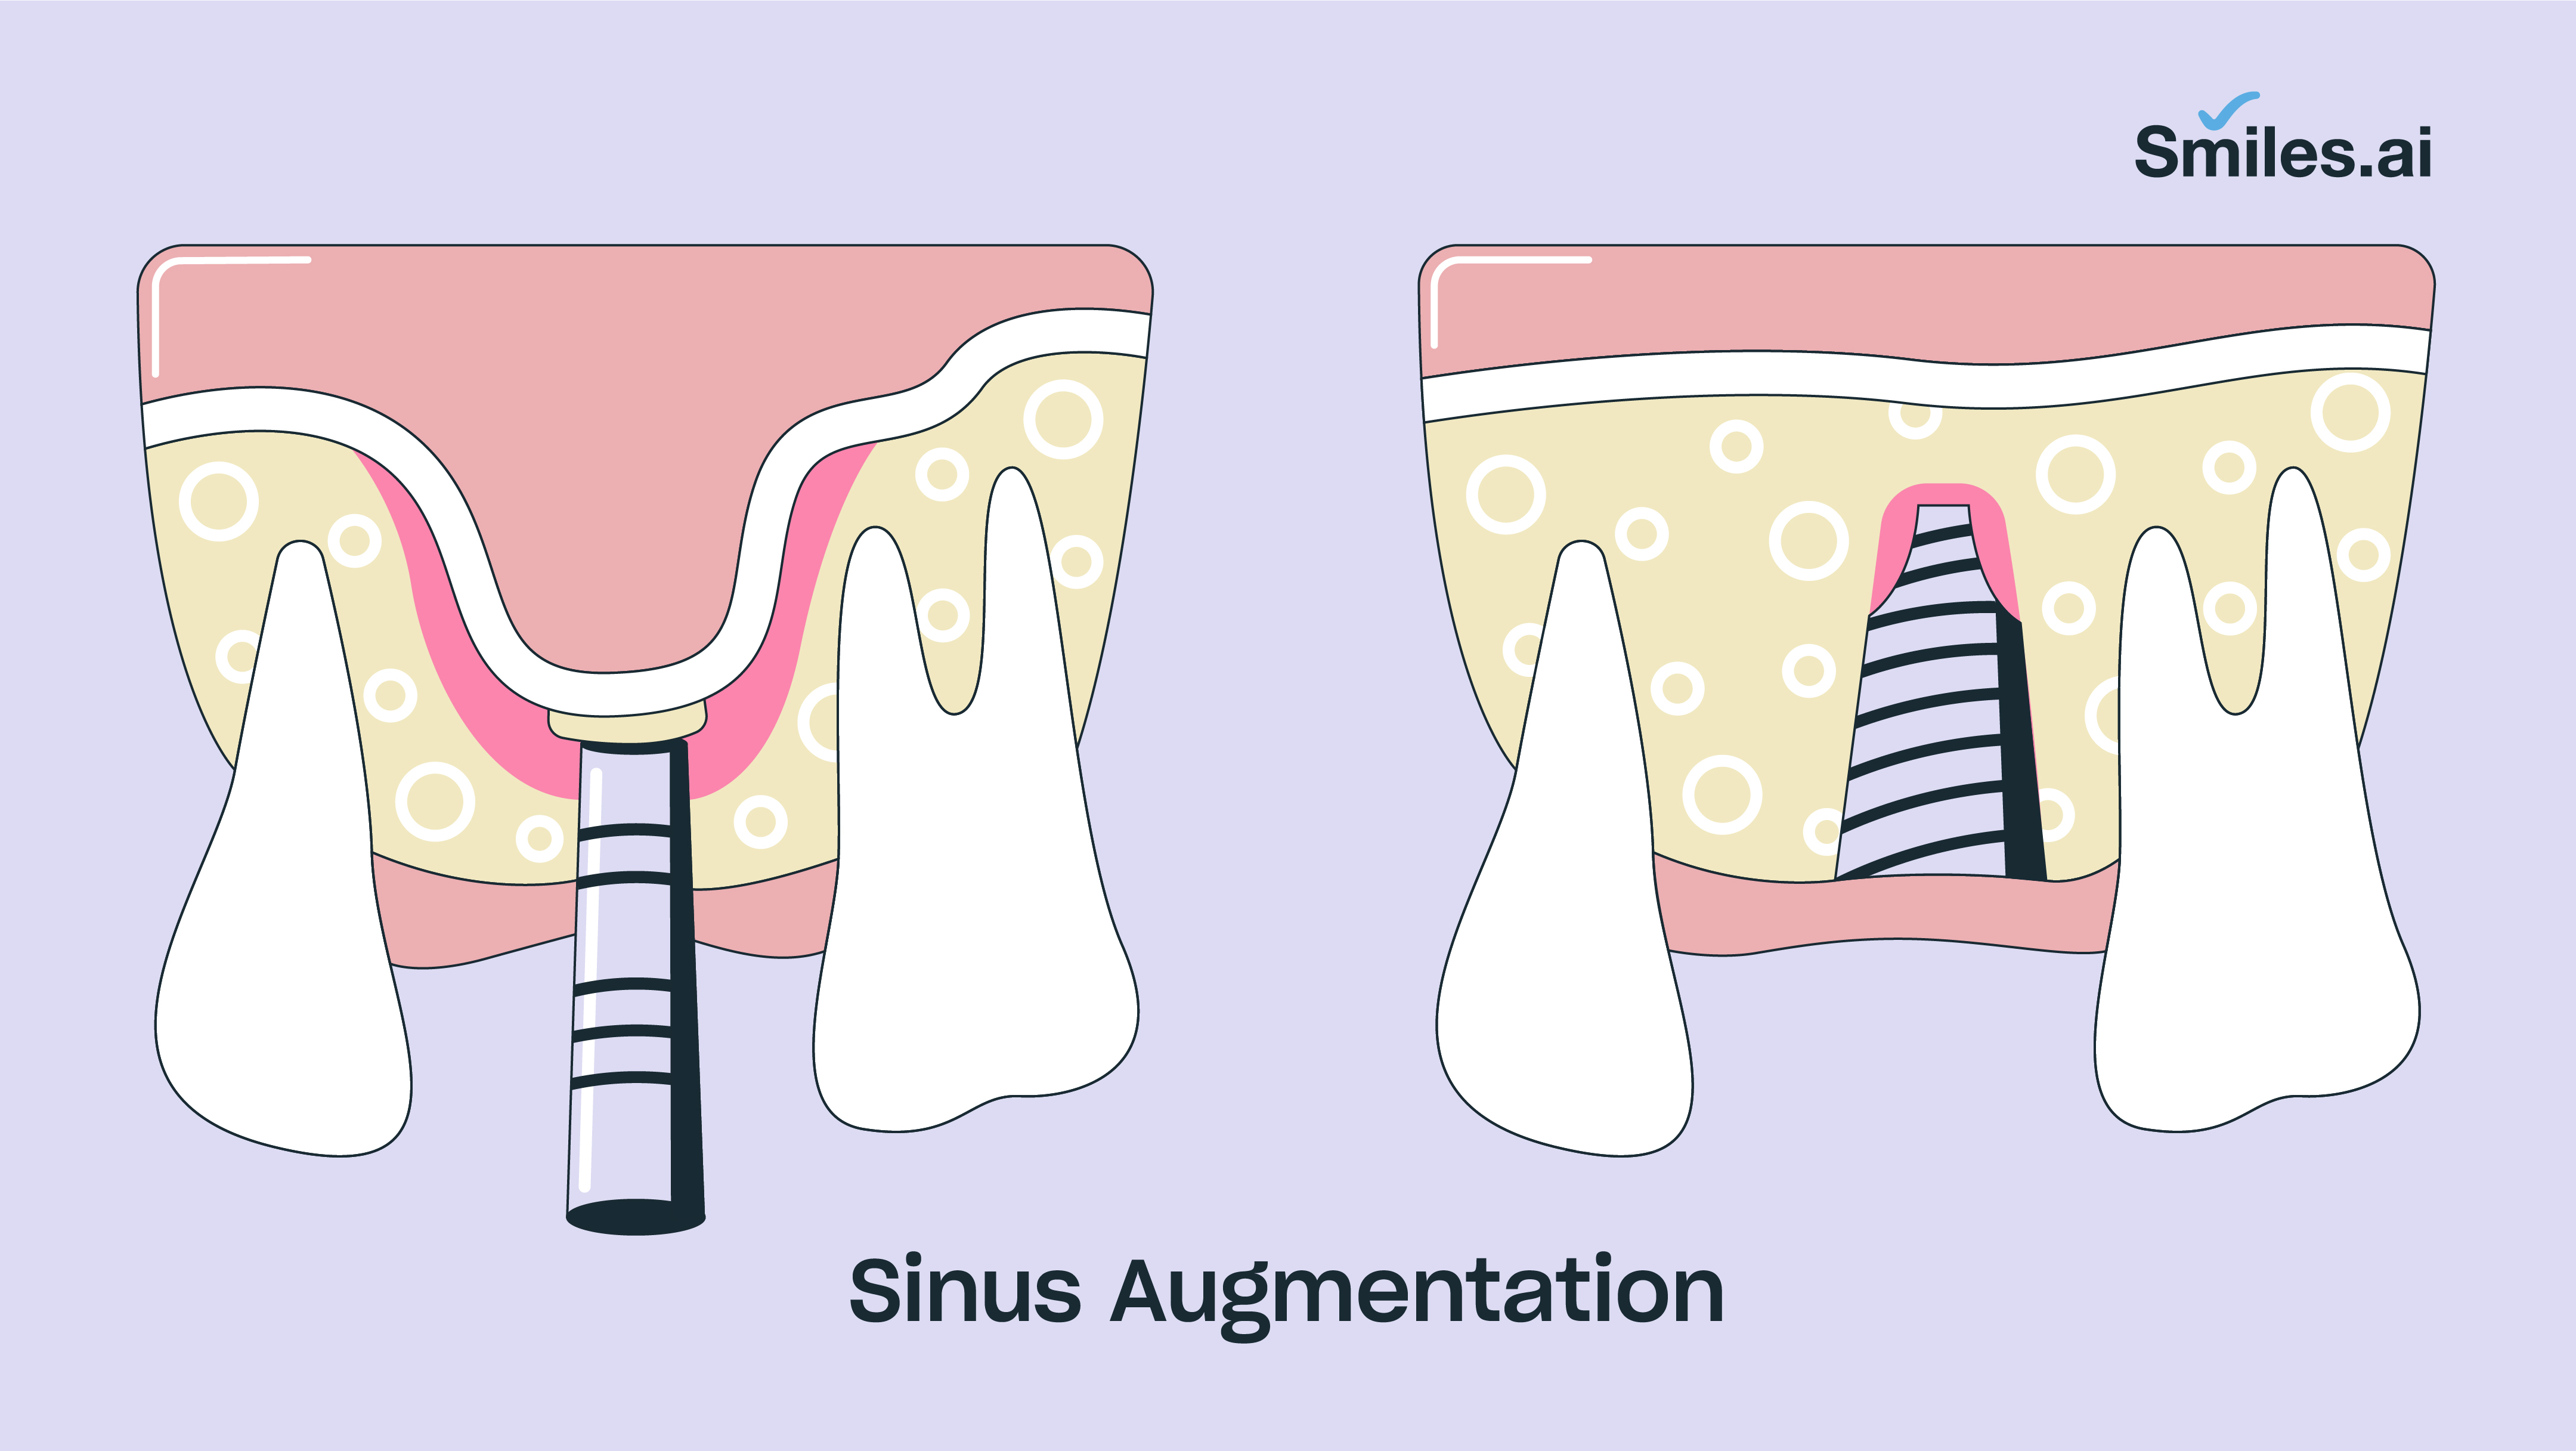 Sinus augmentation